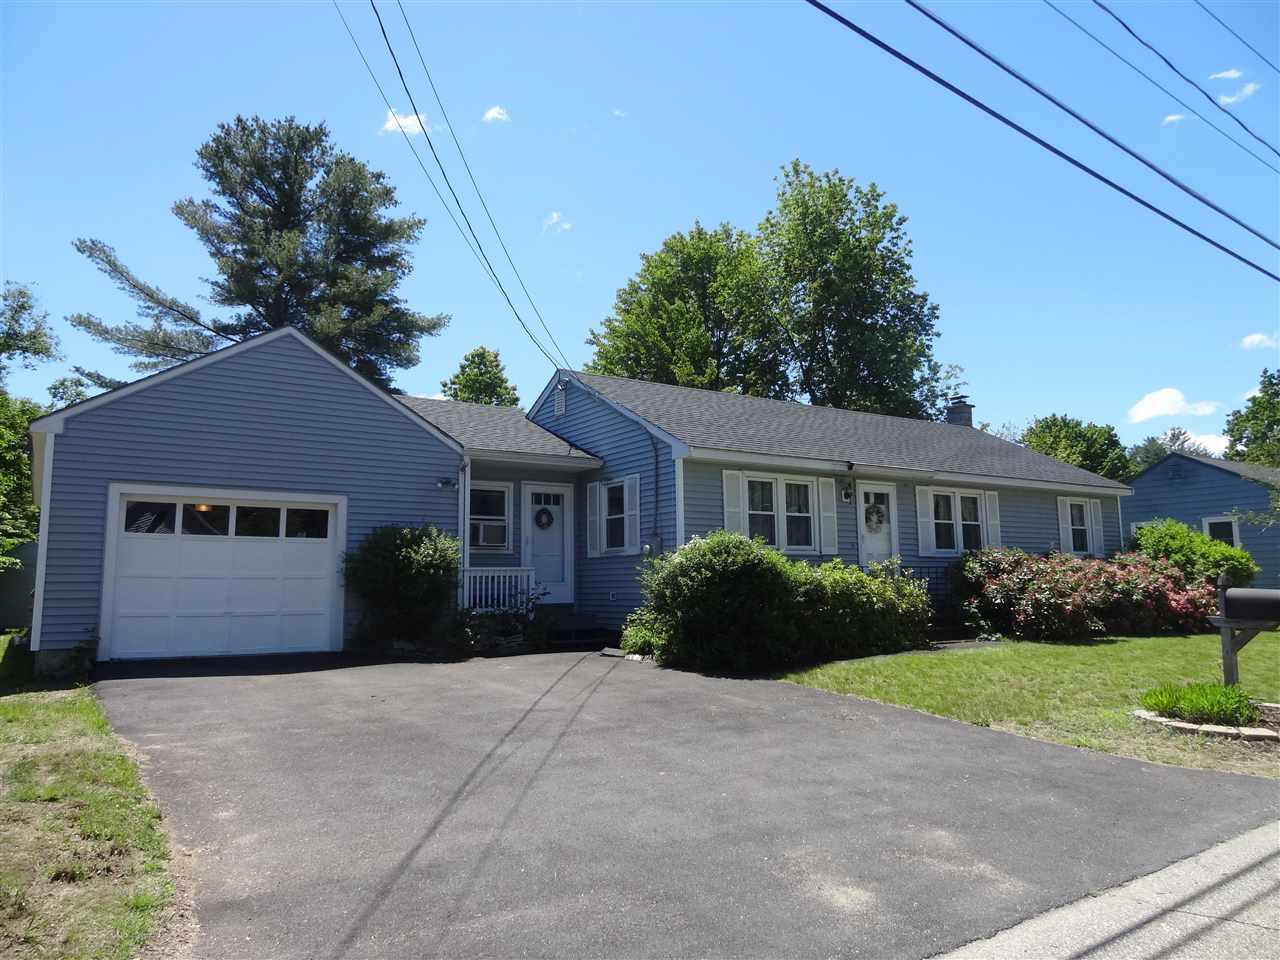 Photo of 7 Winsor Avenue Concord NH 03303